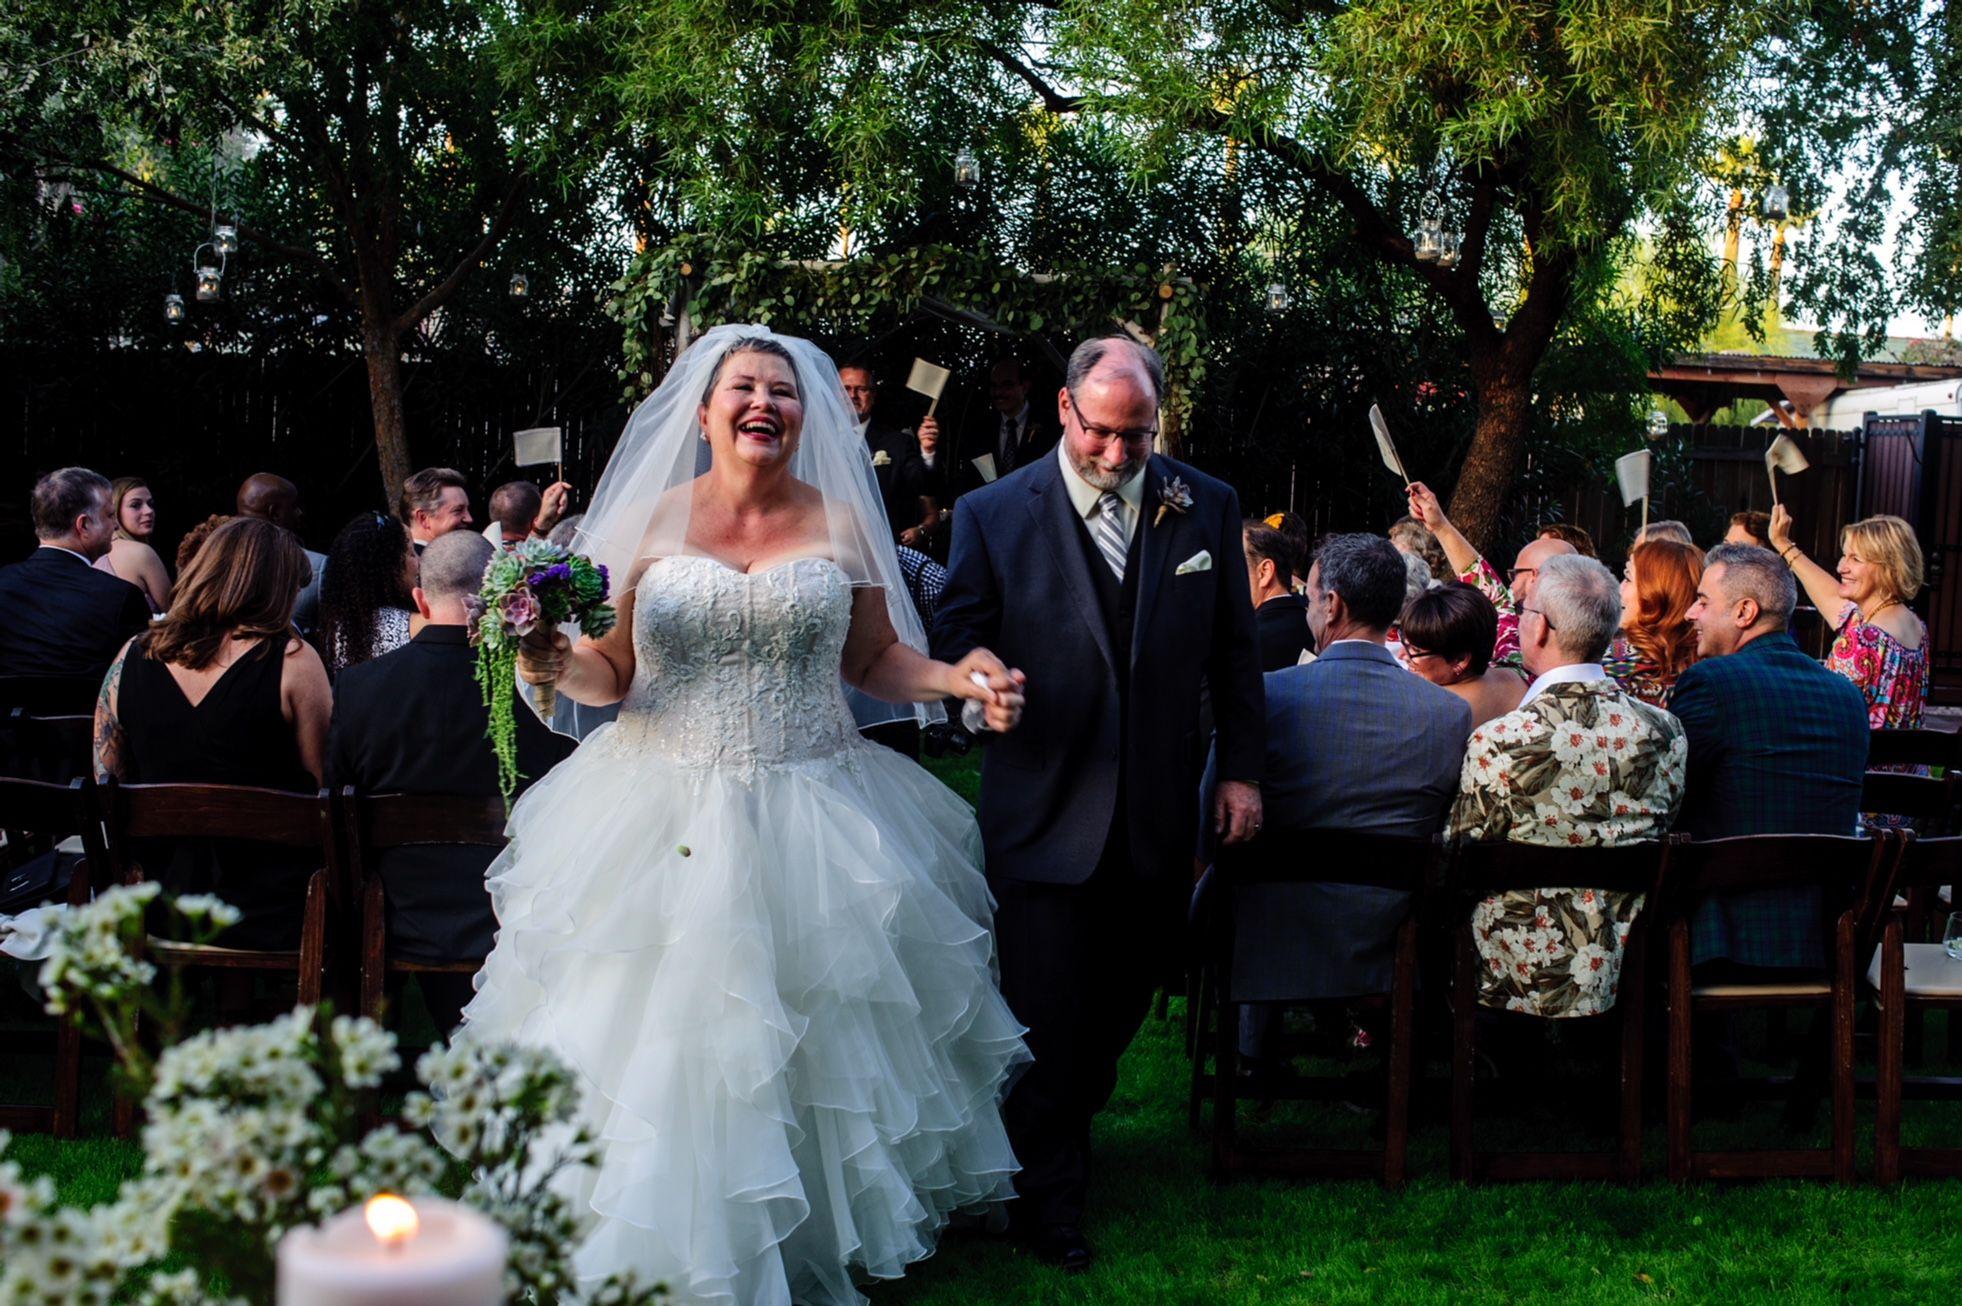 Oleg cassini cwg size w used wedding dresses